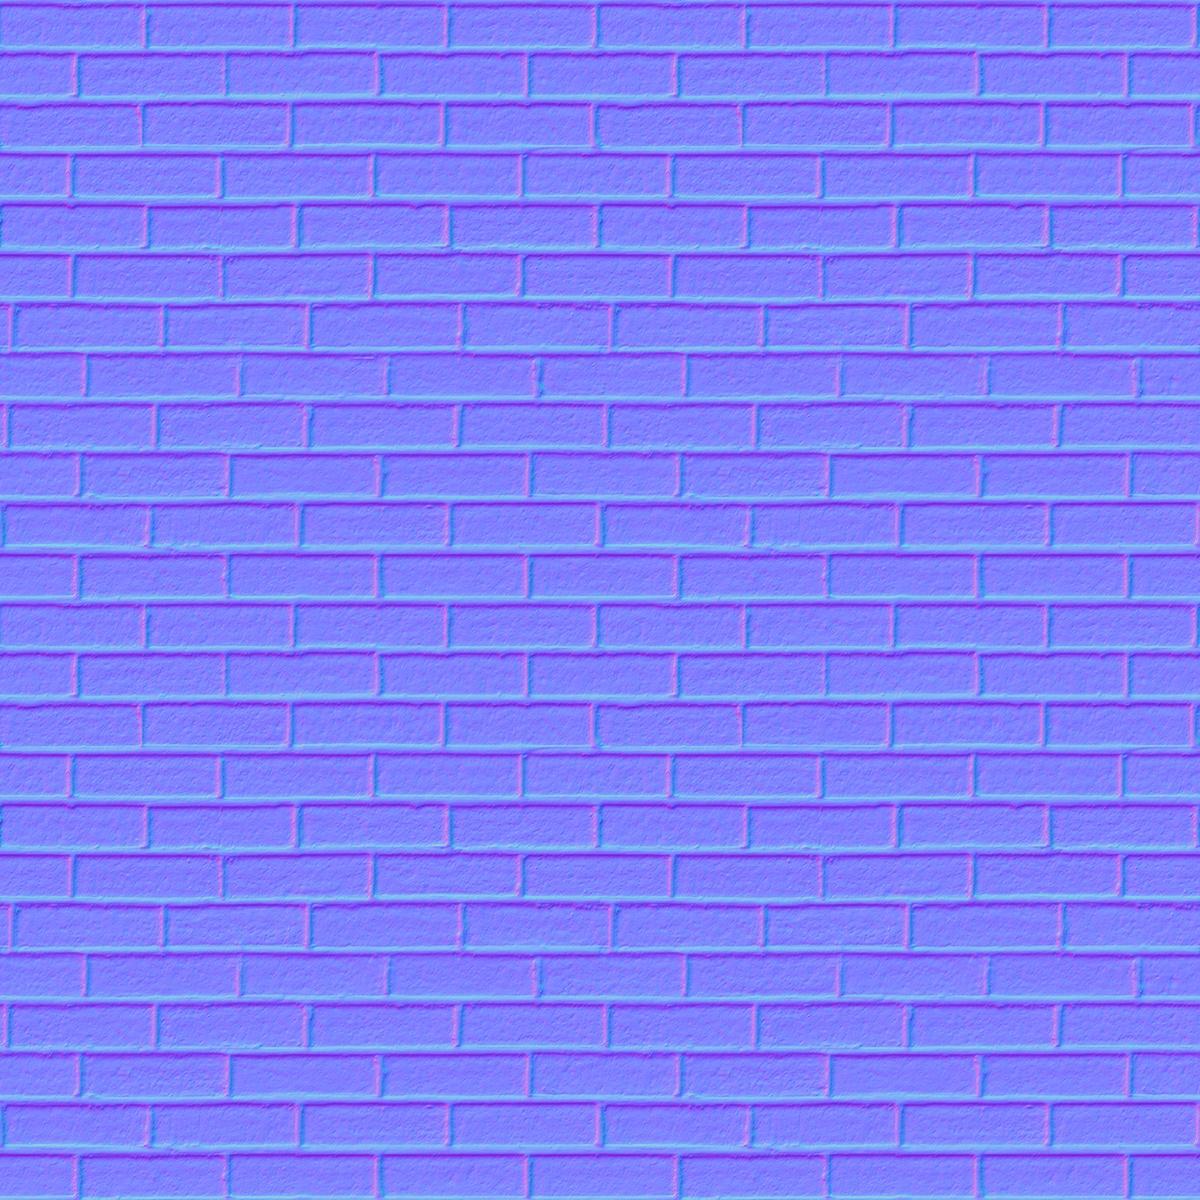 Tileable Grey Brick Wall Texture Maps Texturise Free